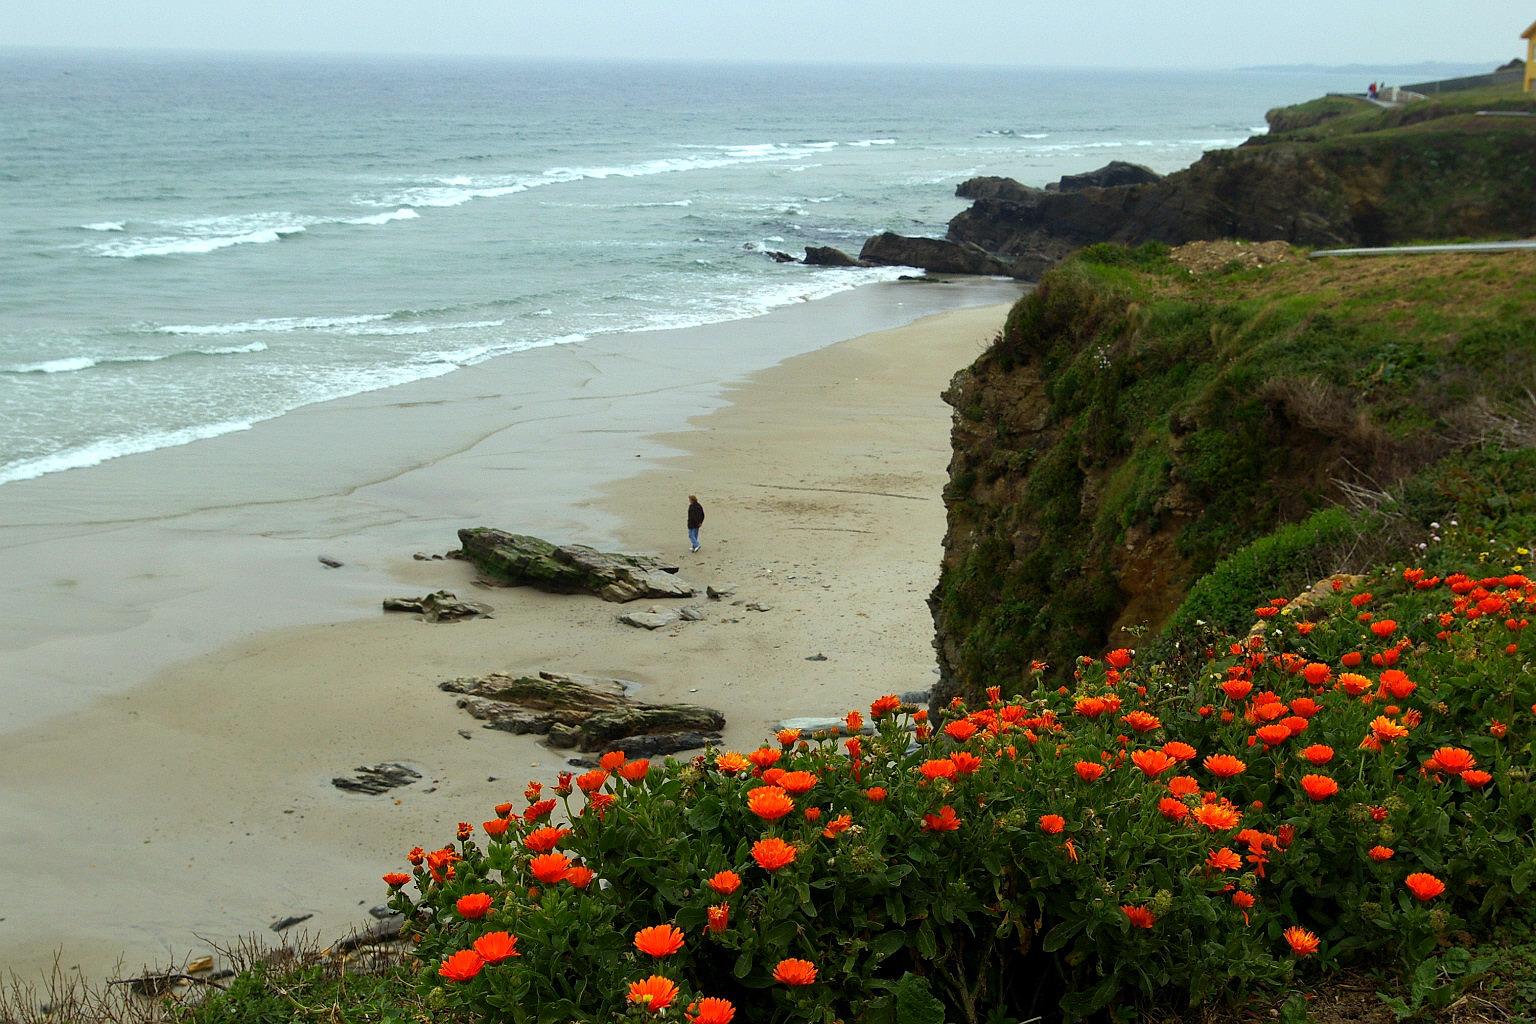 Foto playa San Cosme / Altar. Playa San Bartolo,San Cosme de Barreiros, Lugo, Galicia